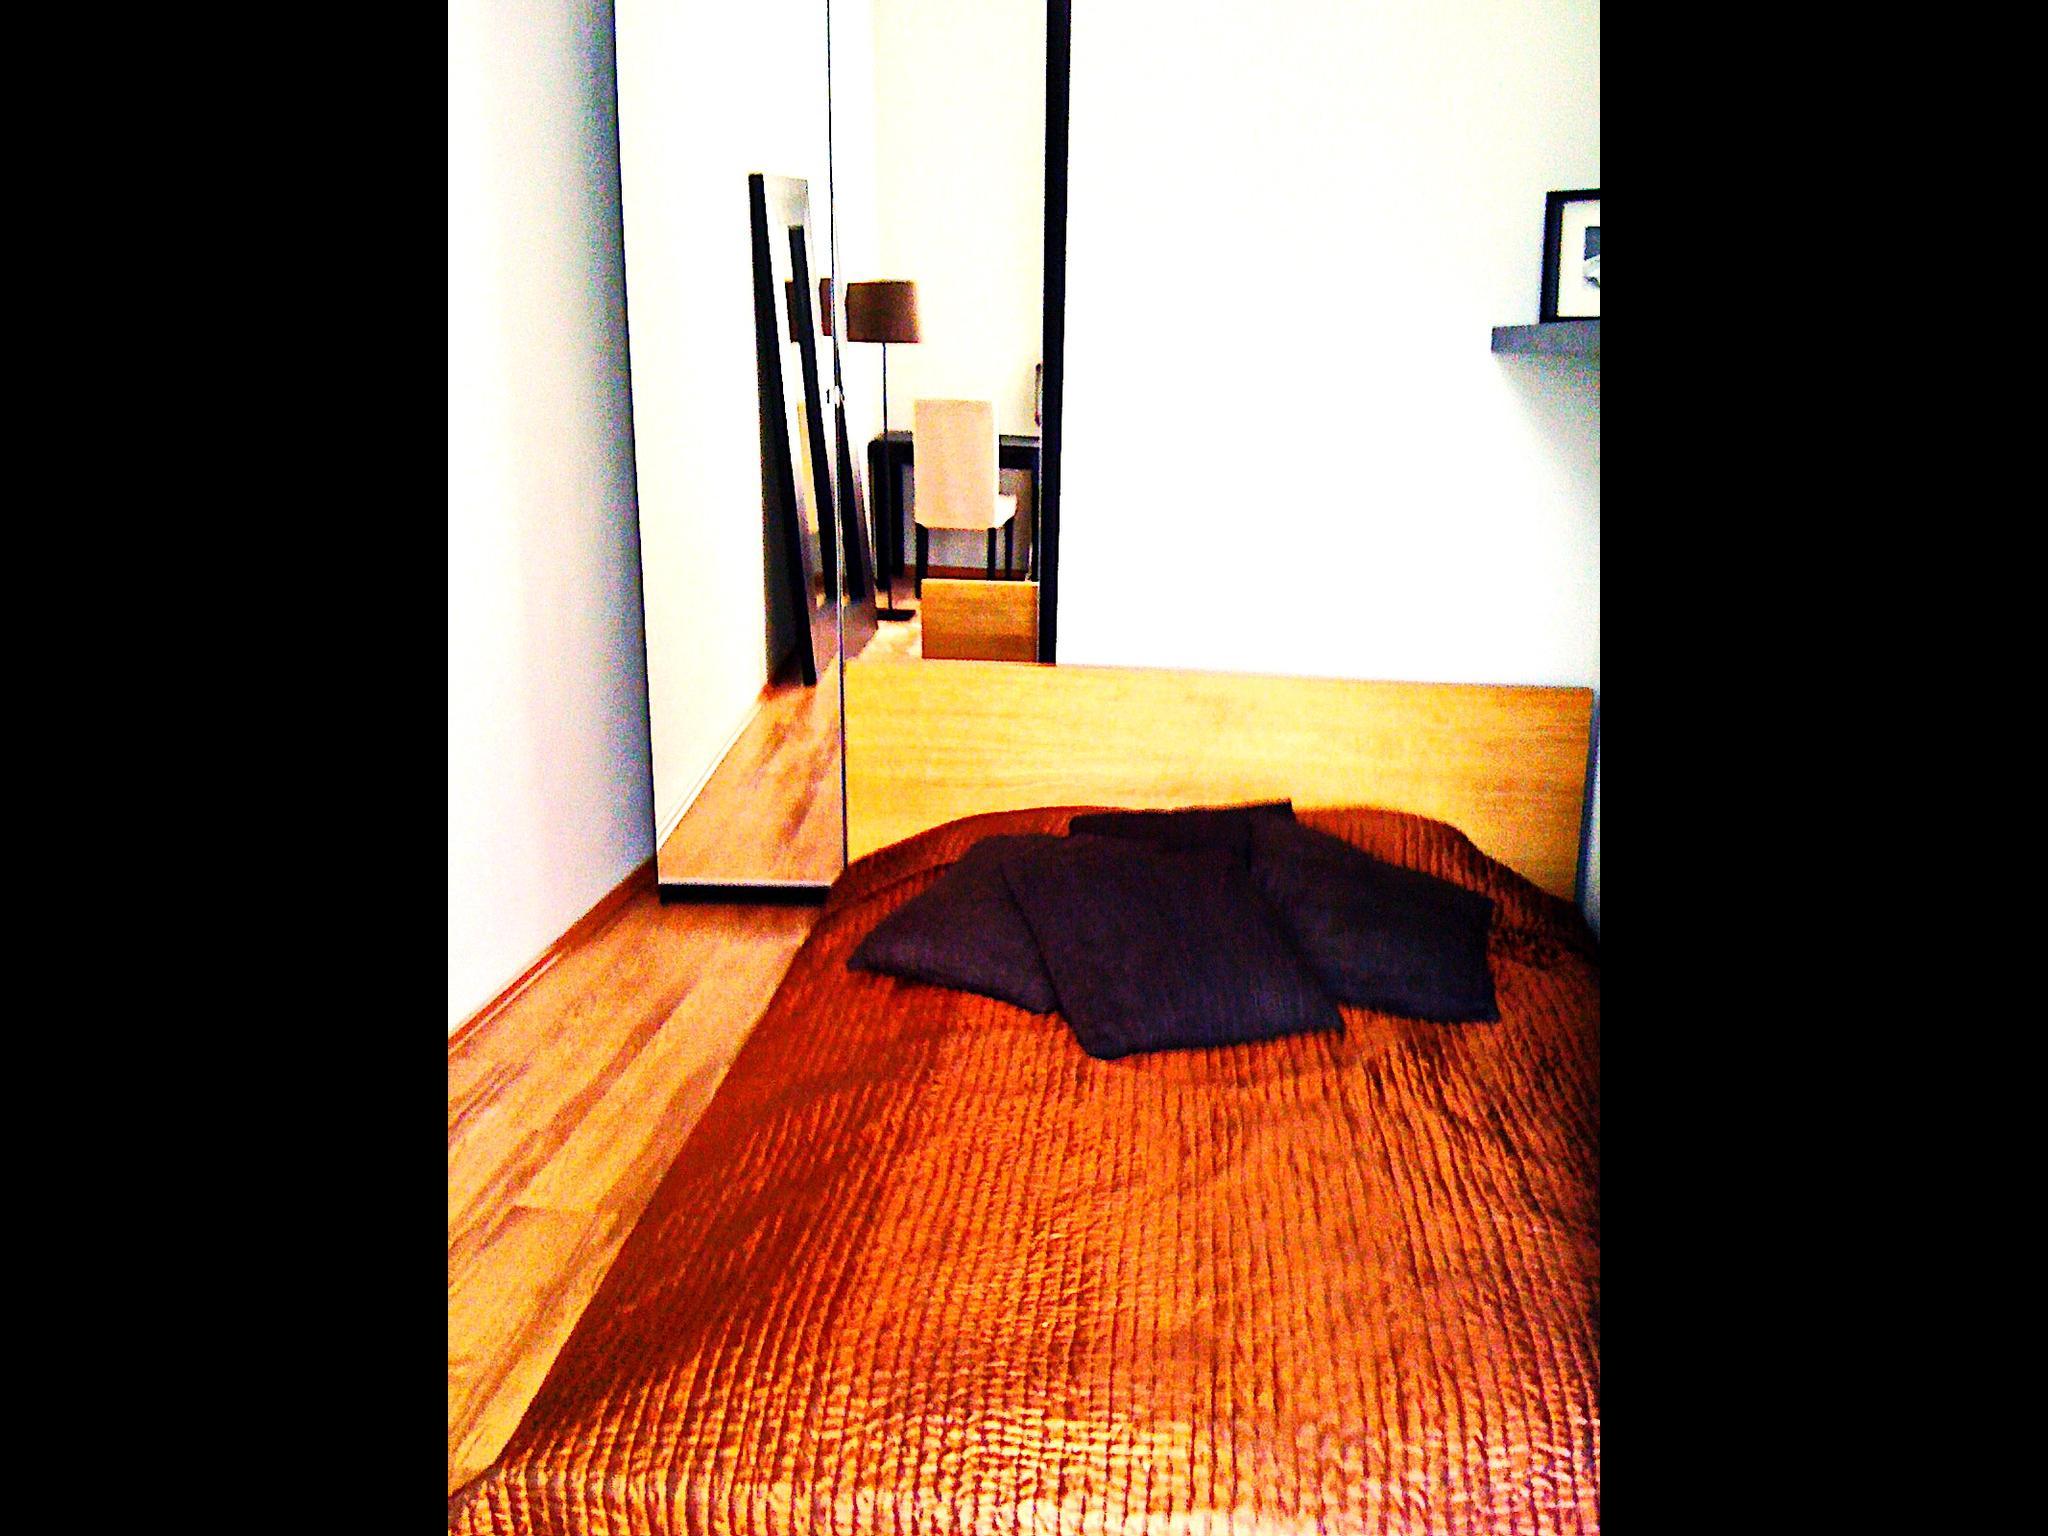 Mozsar - 2 bedroom flat in Budapest